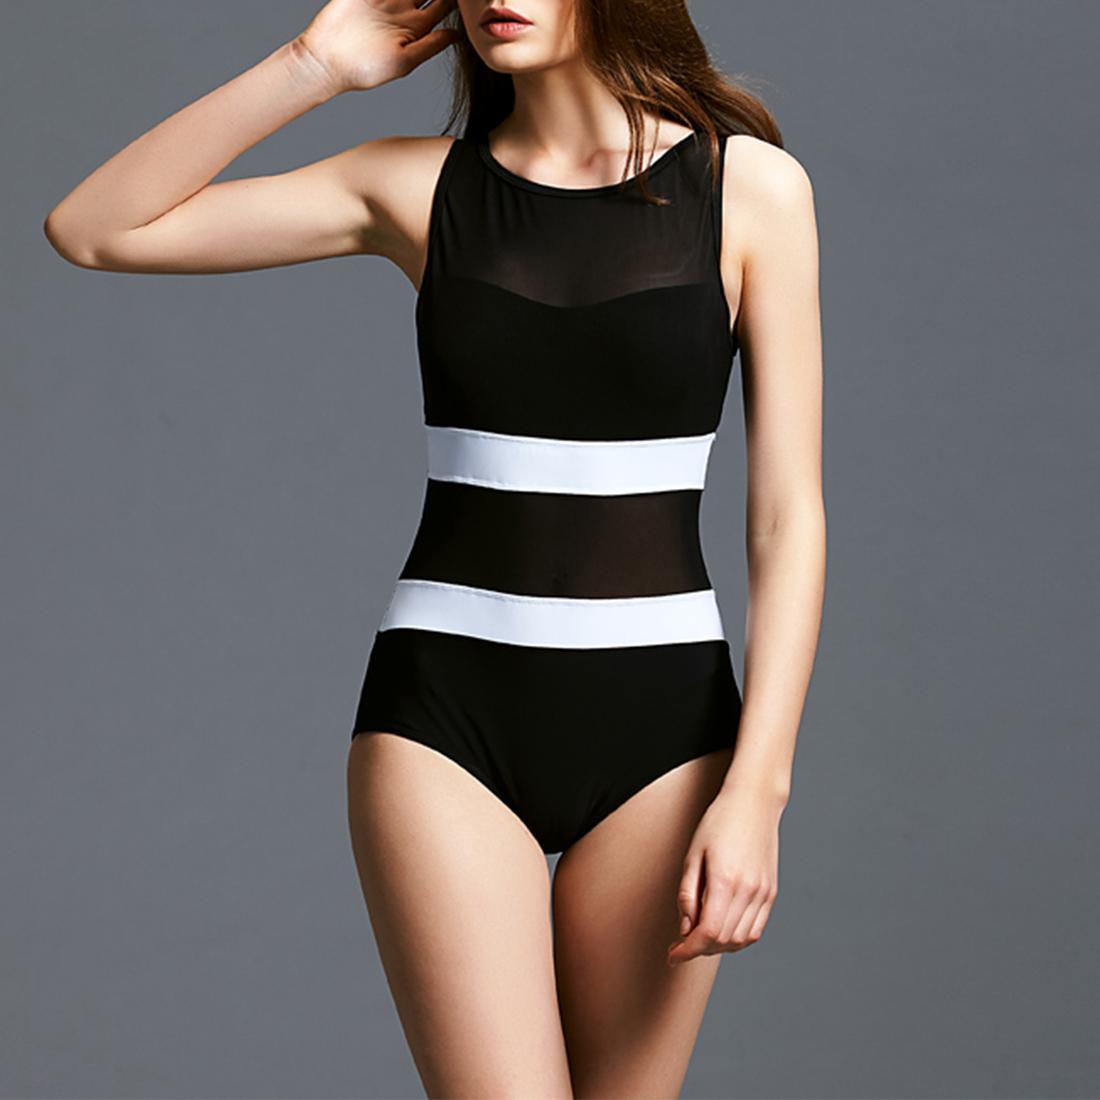 2021 Uimapuku 2018 Swimwear Women Conservative One Piece Swimsuit Net Yarn Bathing Suit Push Up Swim Wear Female Slimming Beach Wear From Mingclothes001 23 05 Dhgate Com